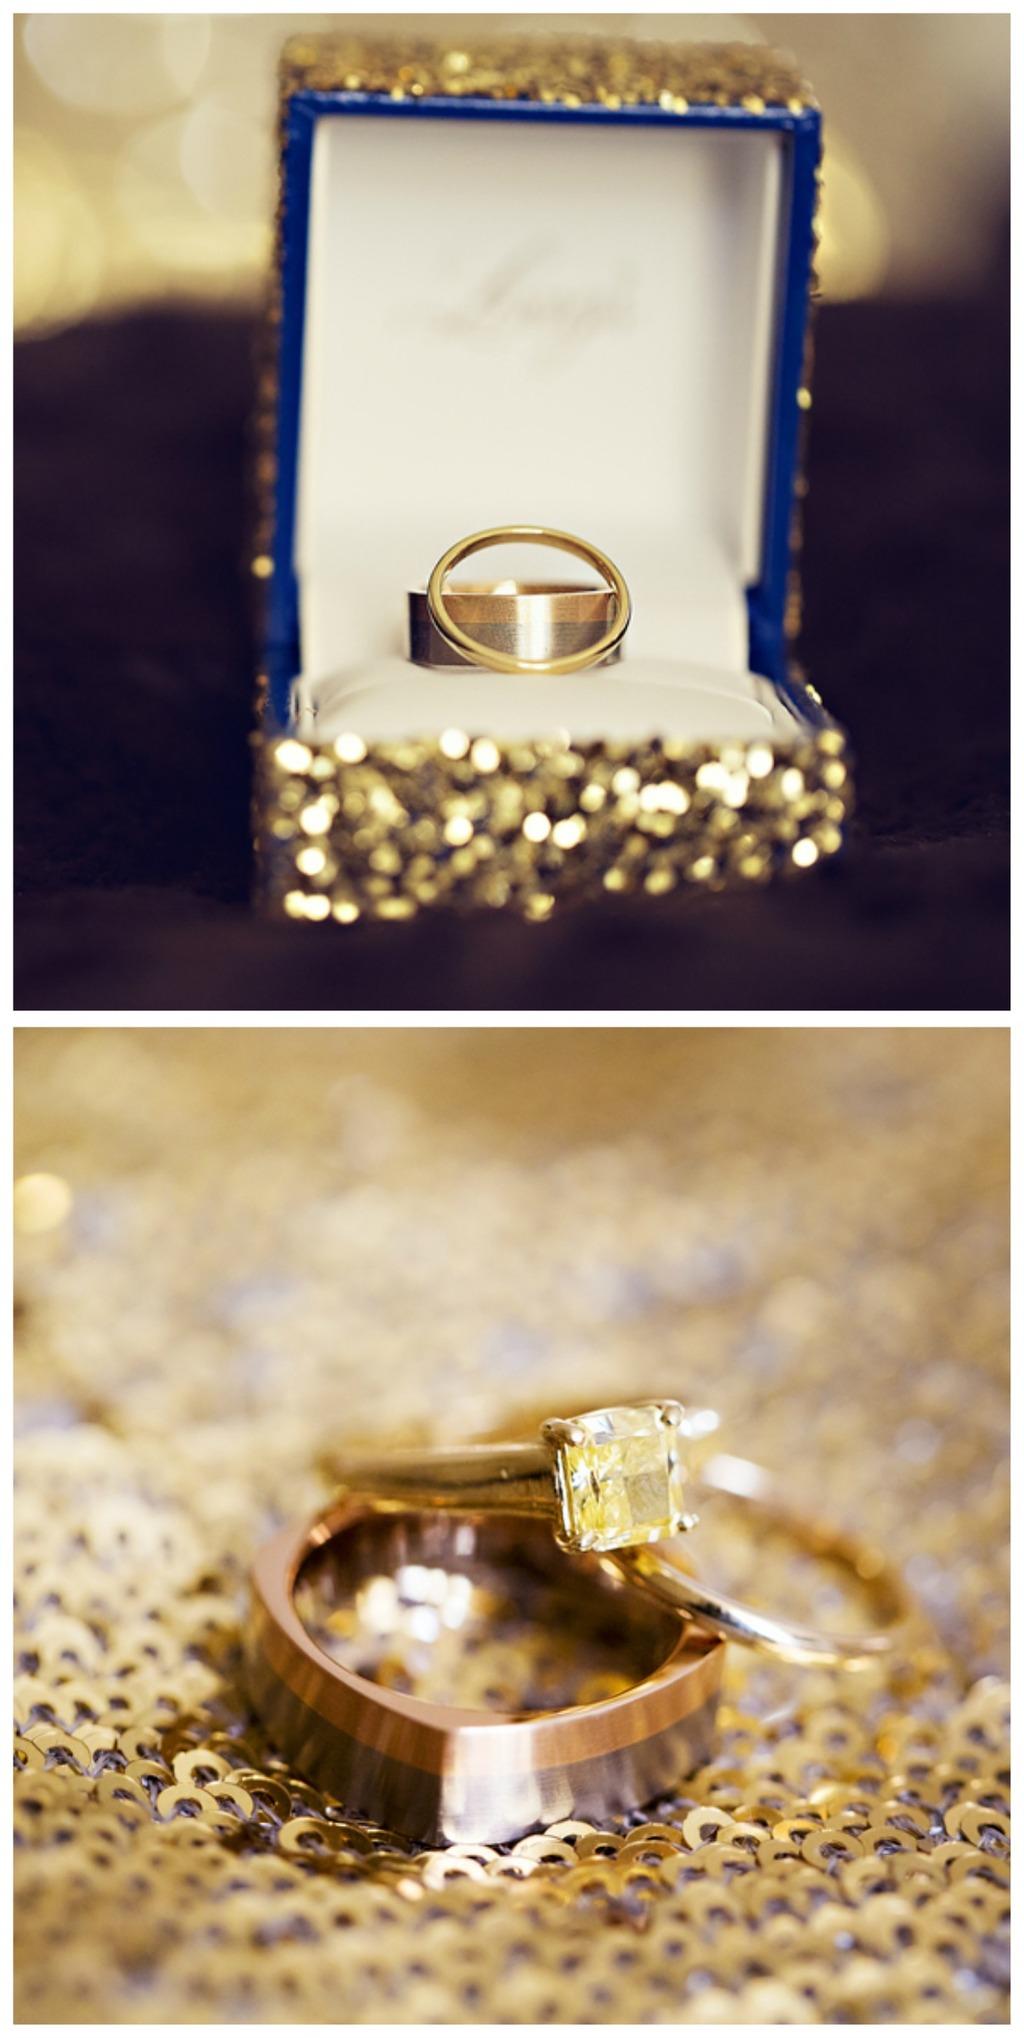 Glitz_and_gold_wedding_rings.full